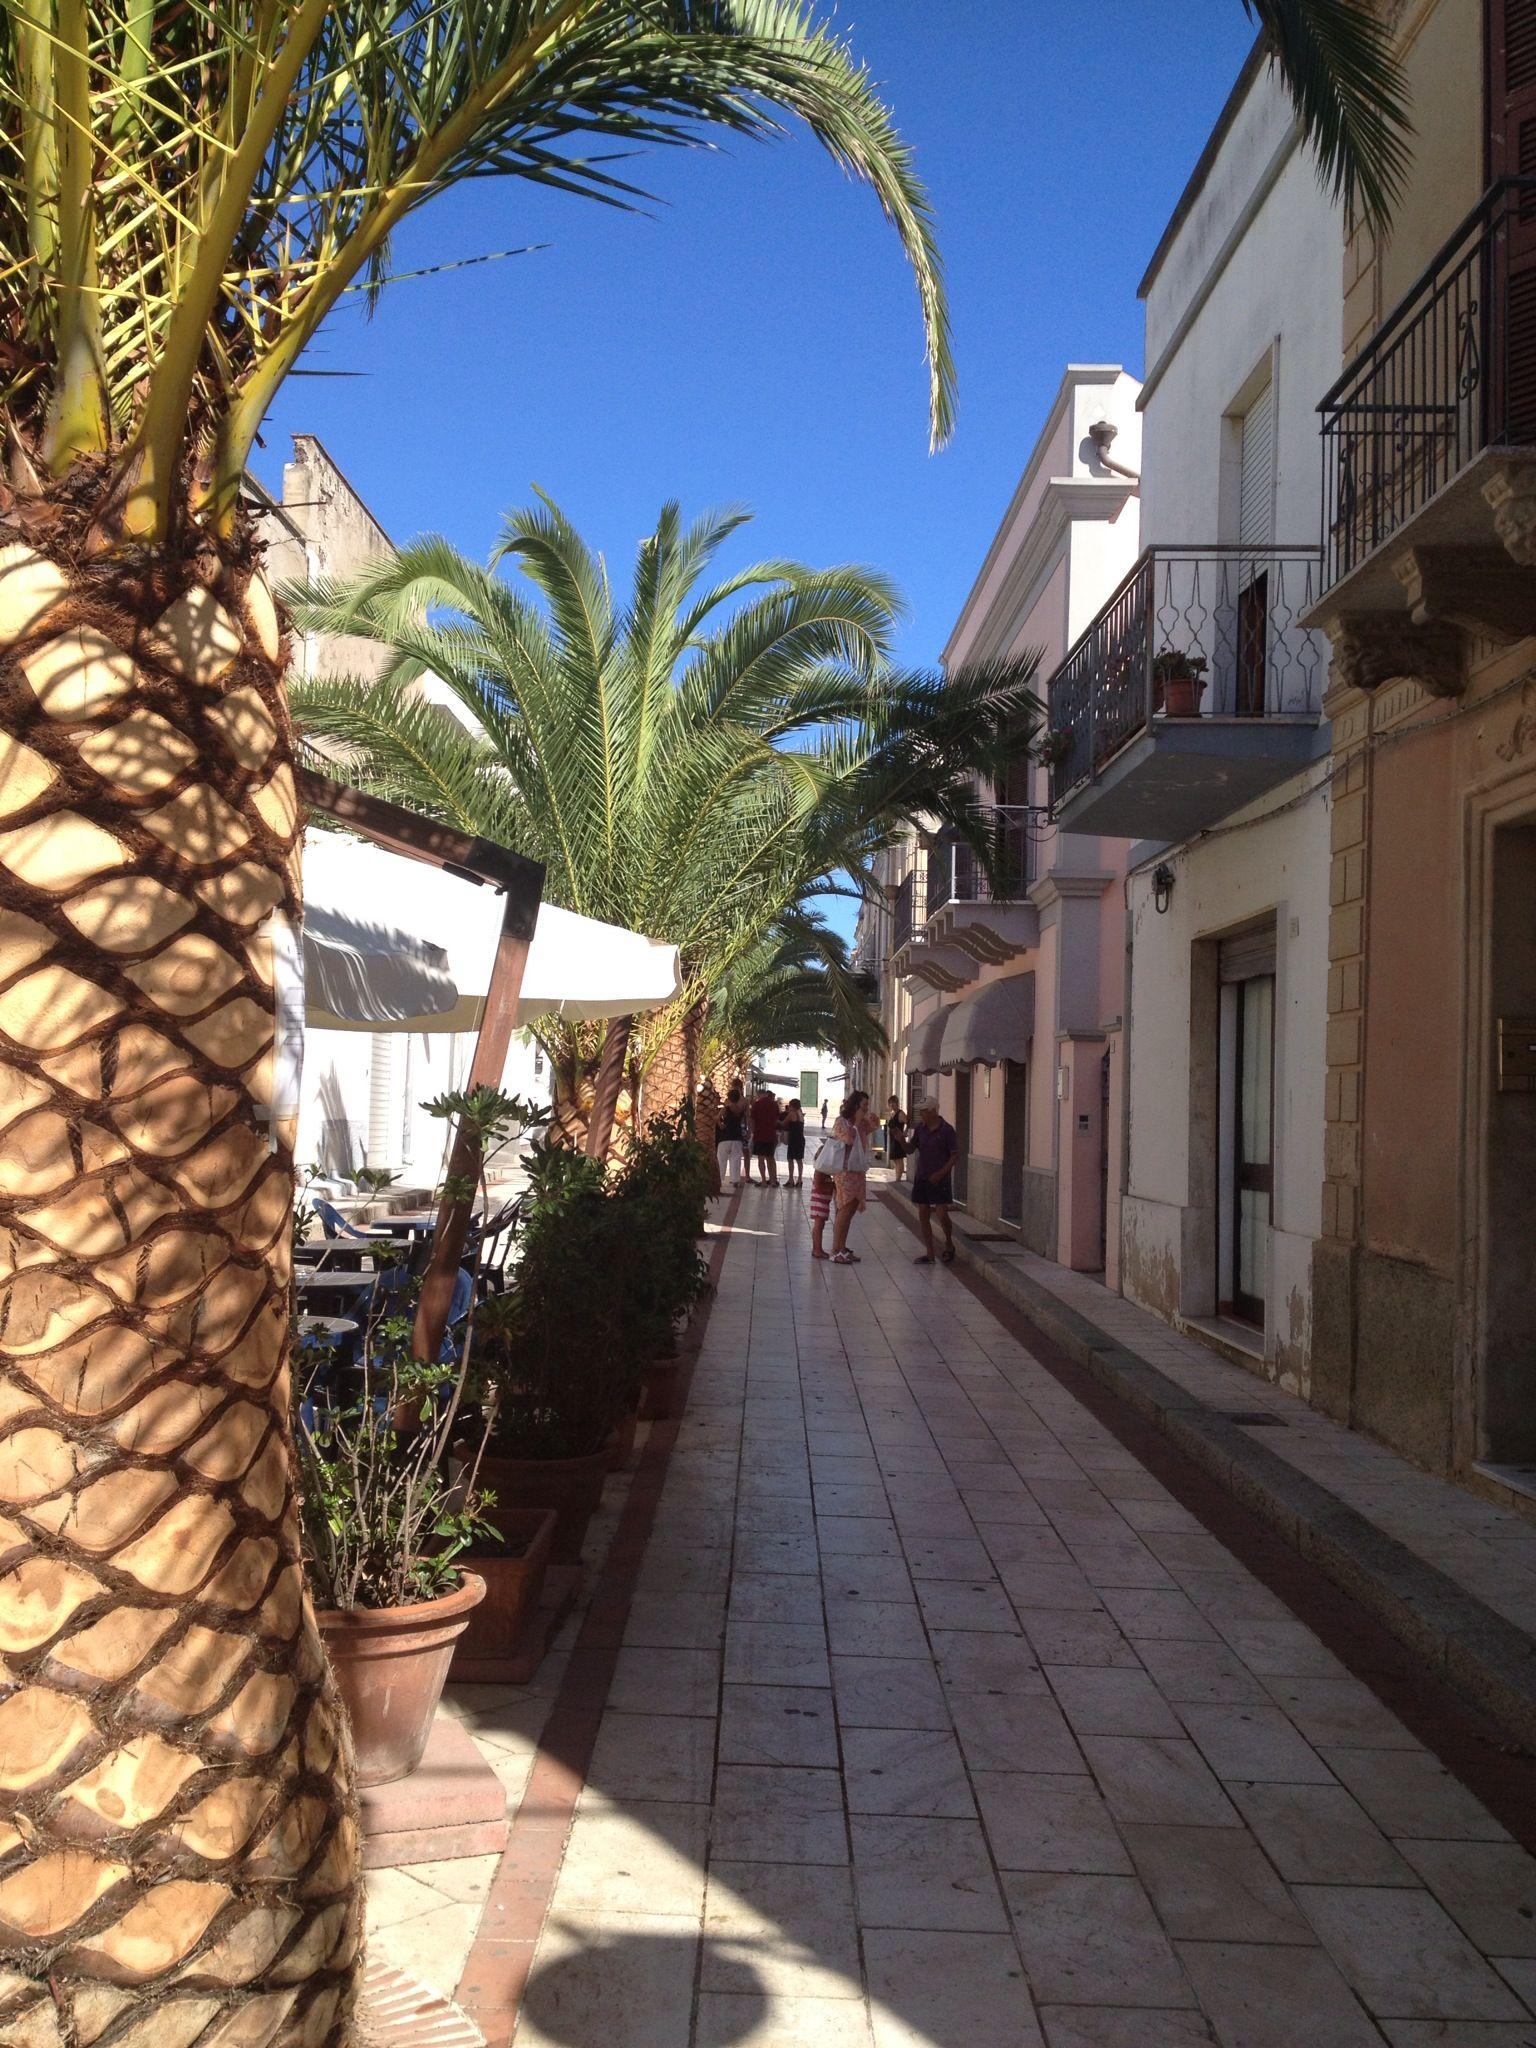 #Calasetta, province of Carbonia-Iglesias  , Sardegna region Italy